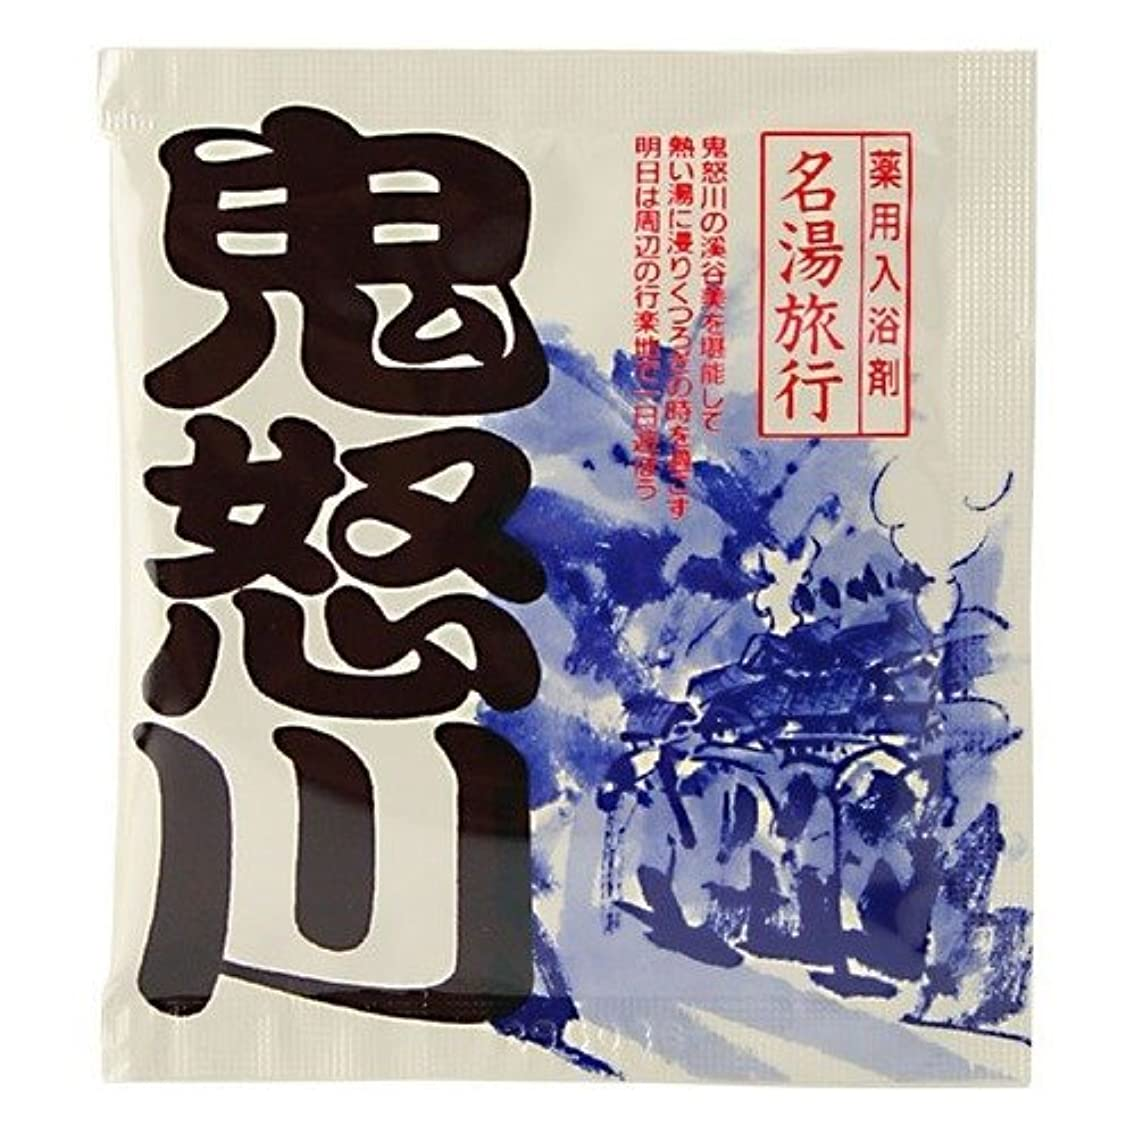 の前で鎮静剤実業家五洲薬品 名湯旅行 鬼怒川 25g 4987332126706